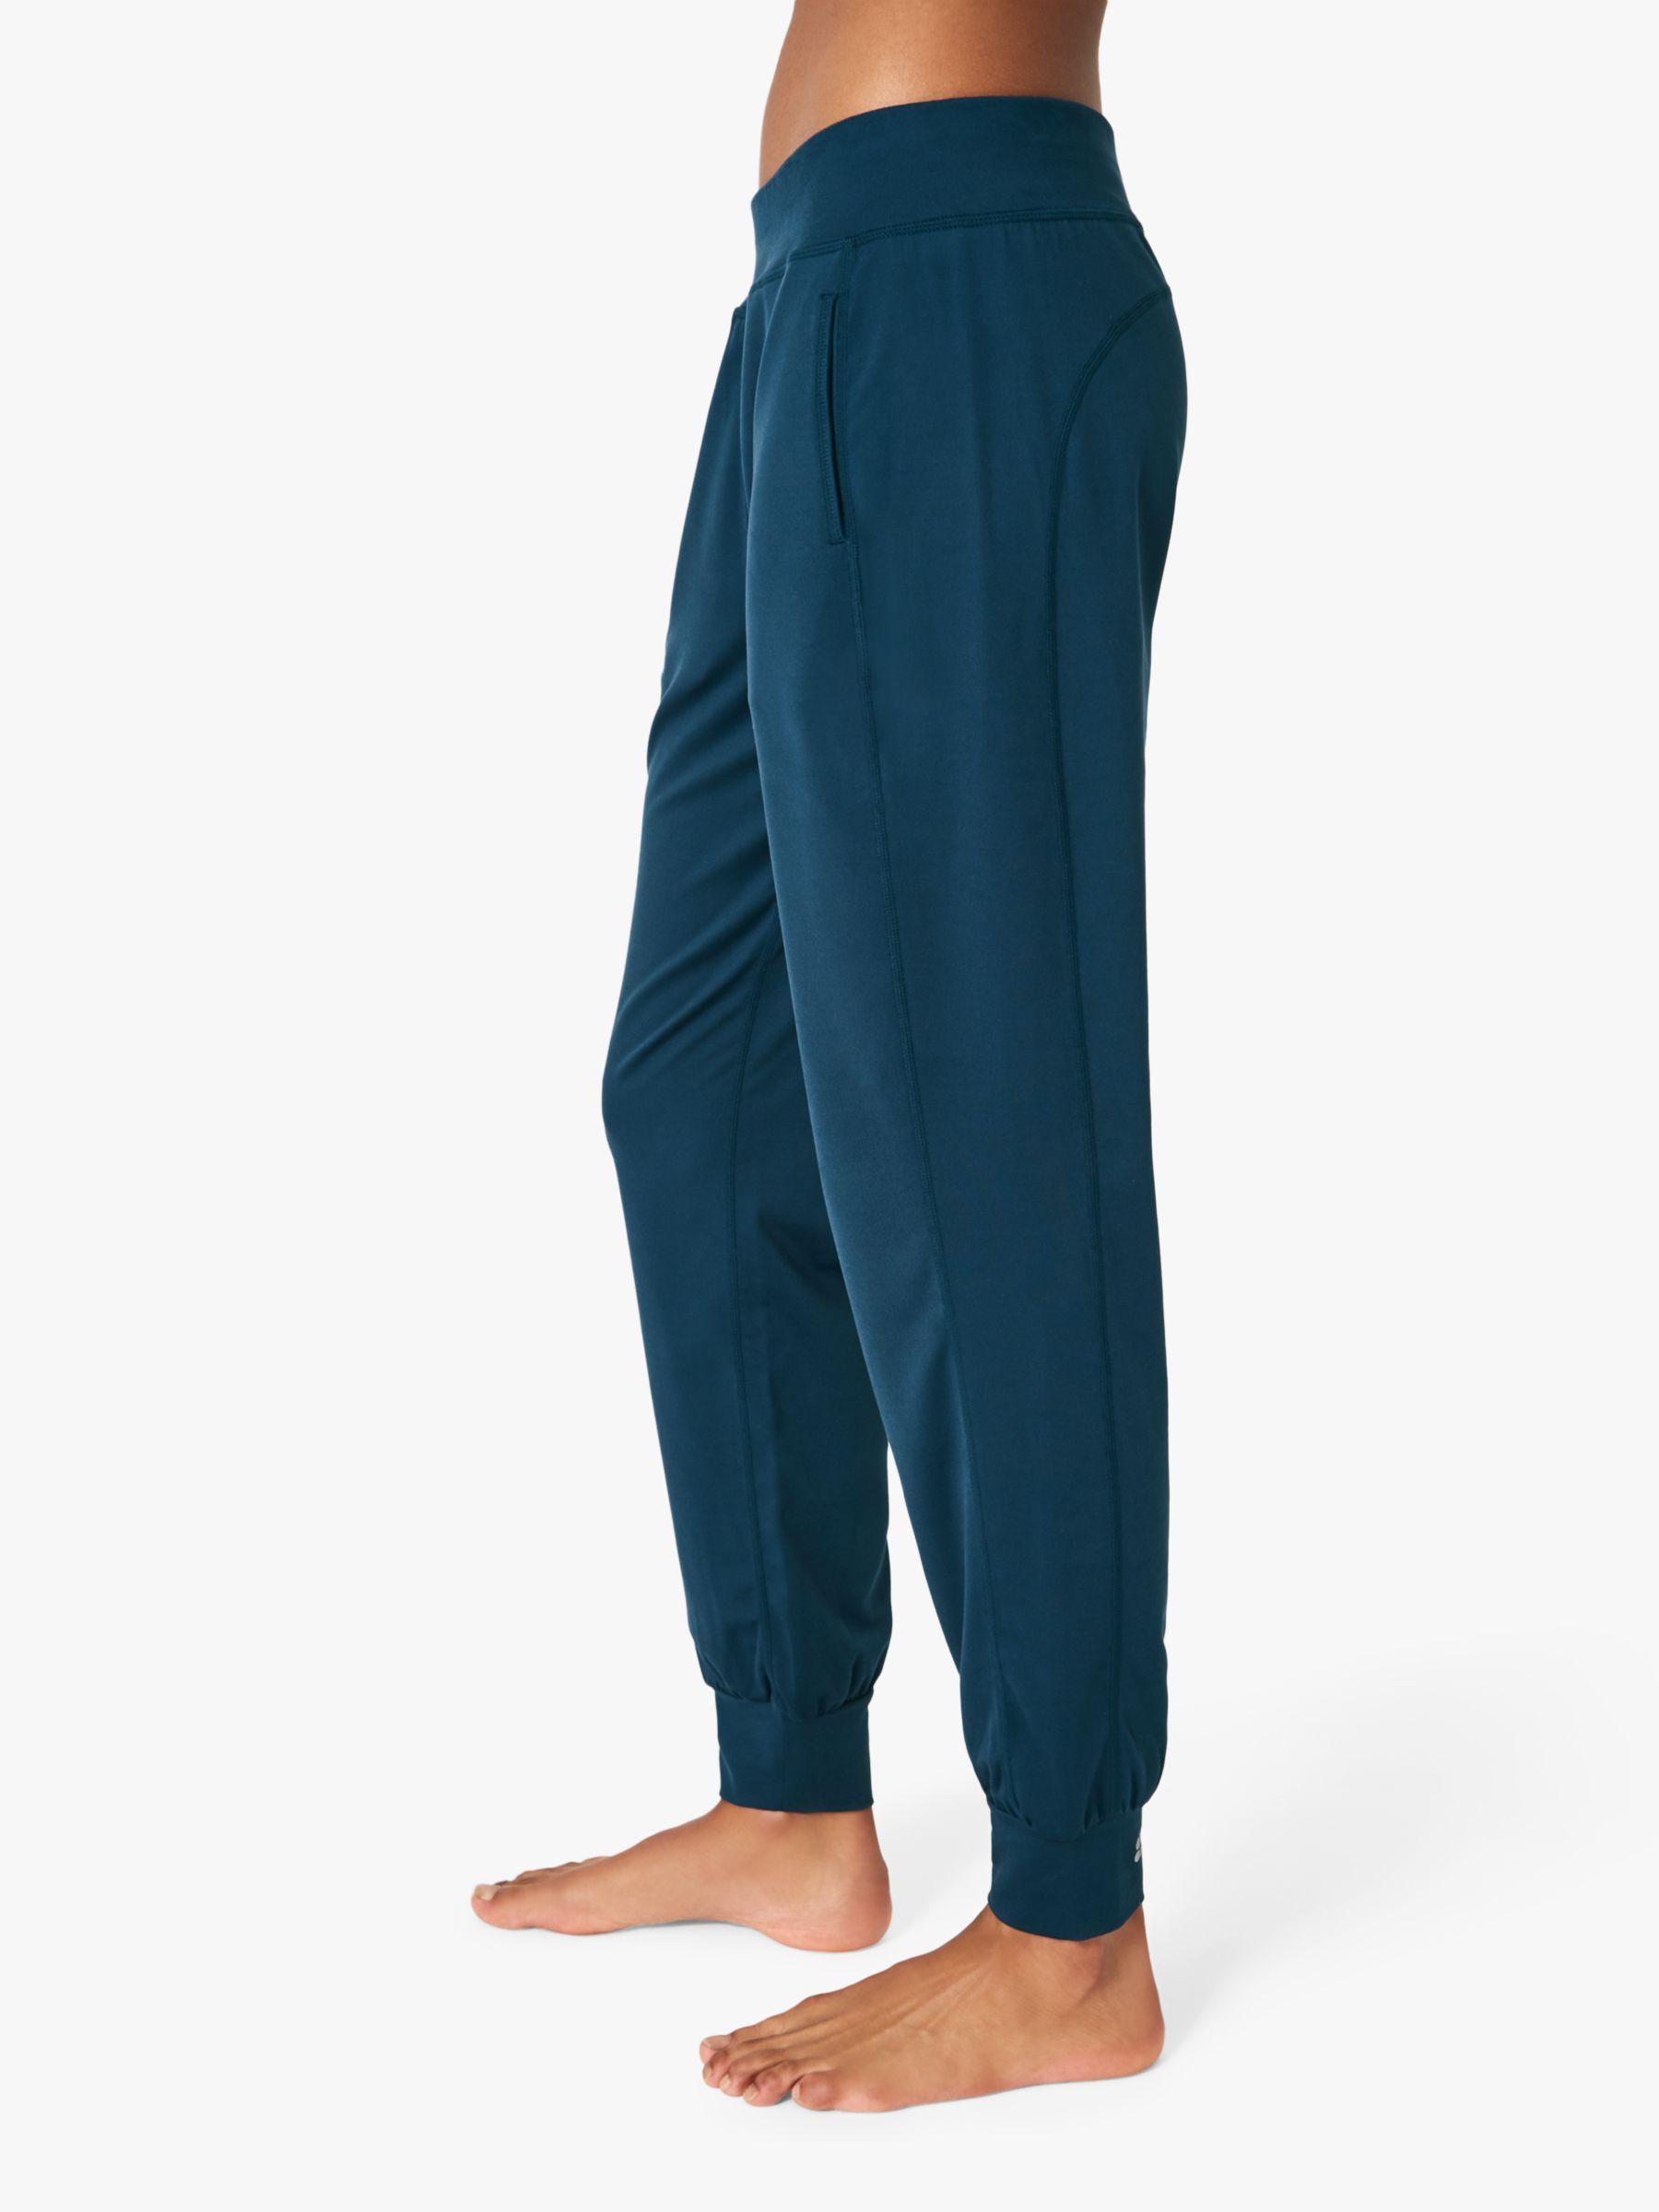 Sweaty Betty Gary Yoga Pants, Black